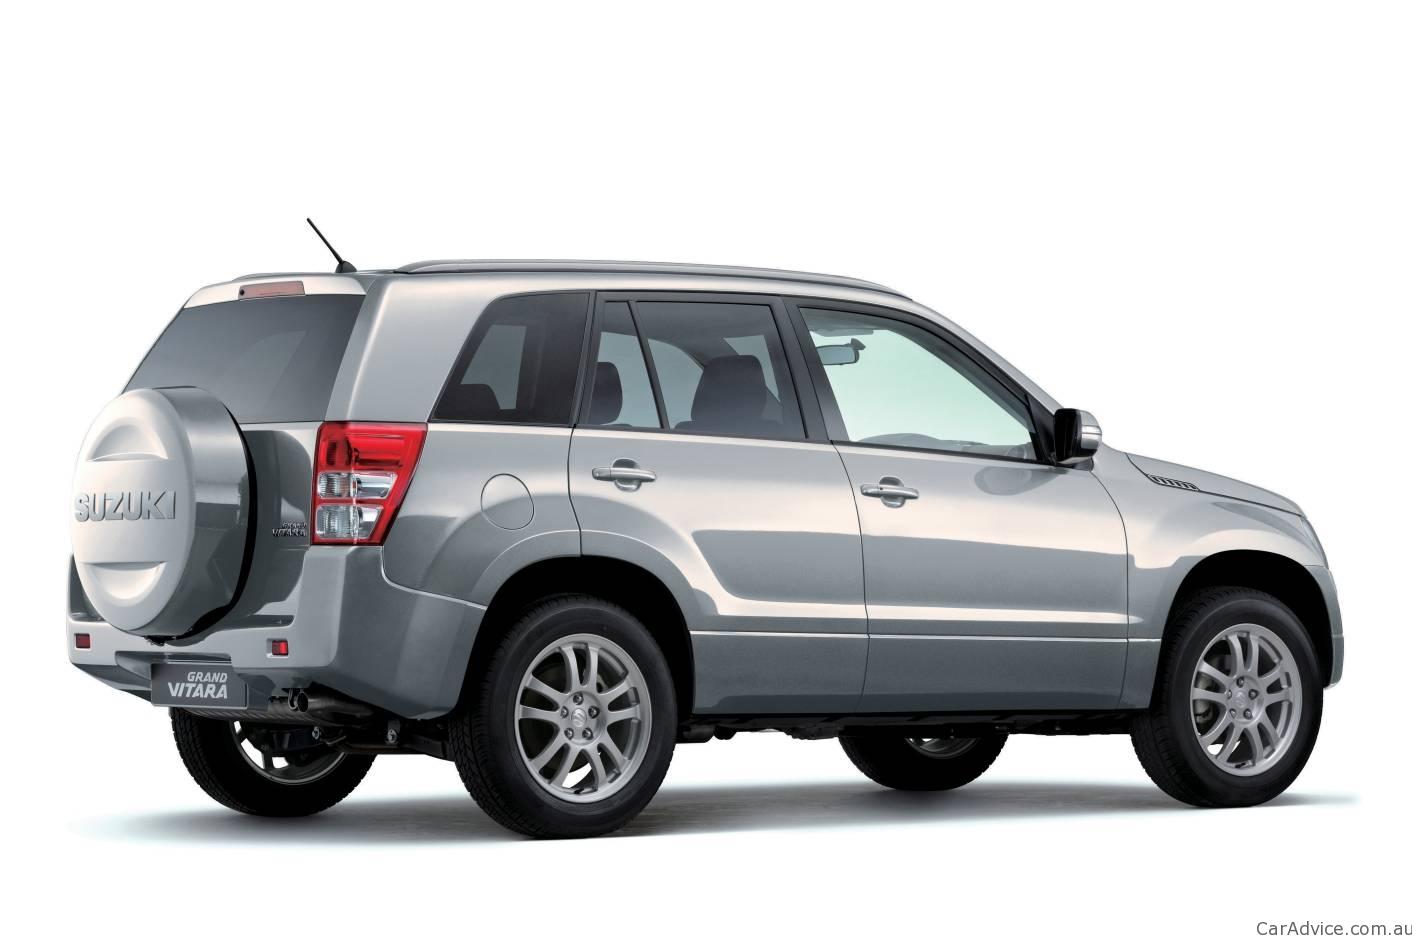 Suzuki Grand Vitara Sport On Sale In Australia Photos 1